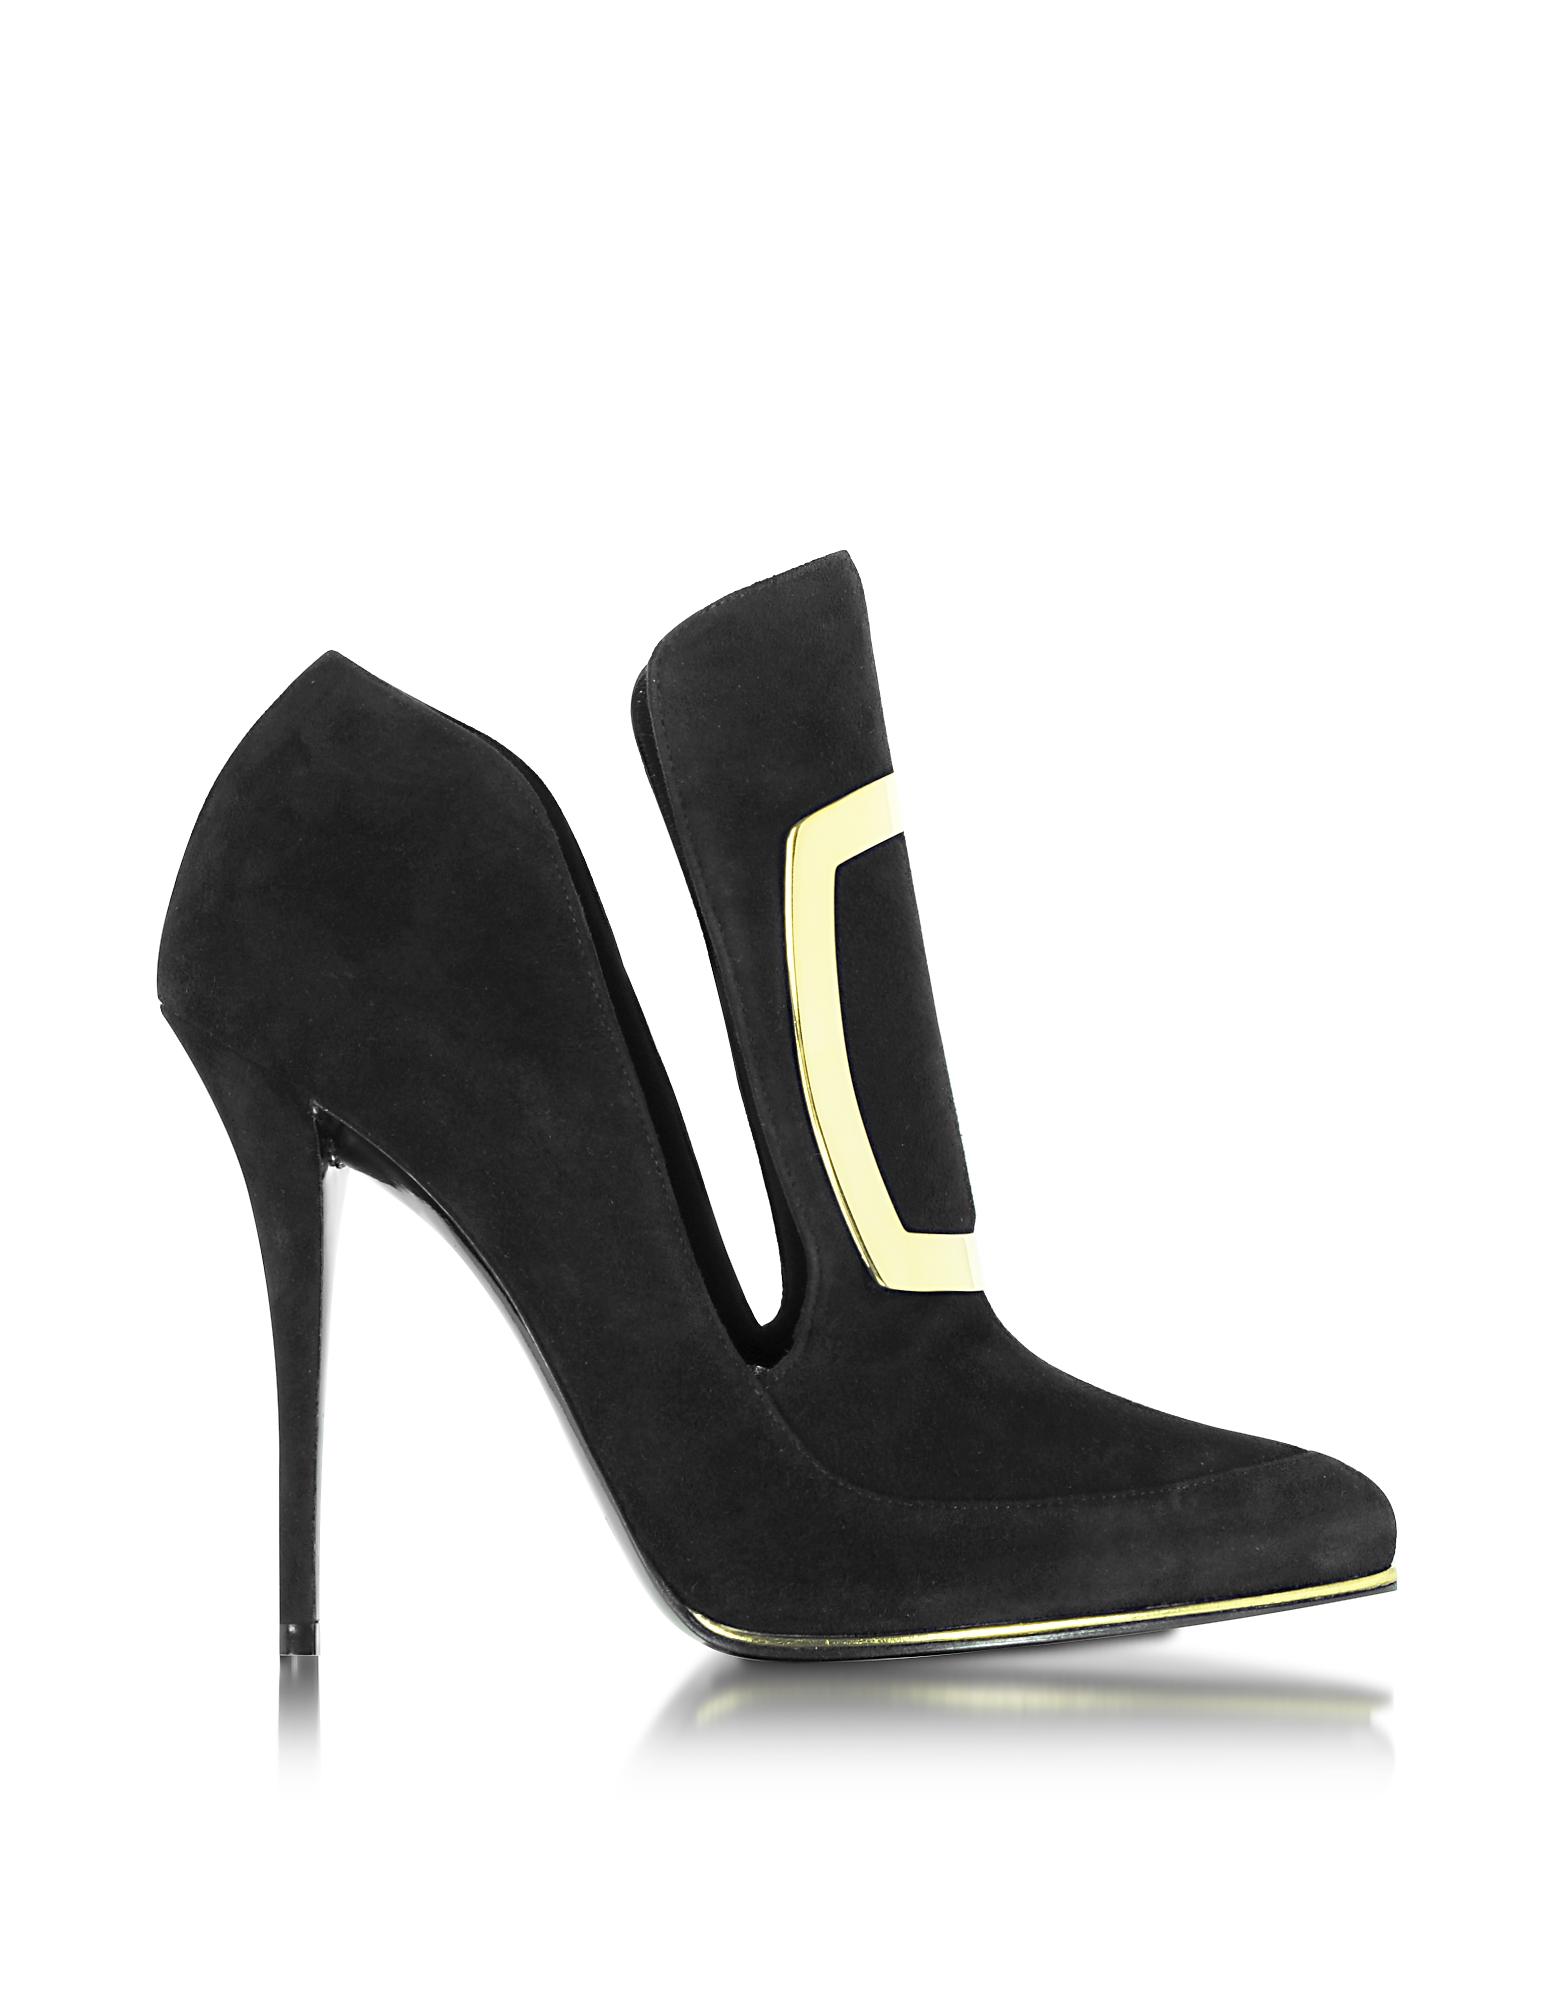 Balmain Shoes, Desiree Black Suede Pump